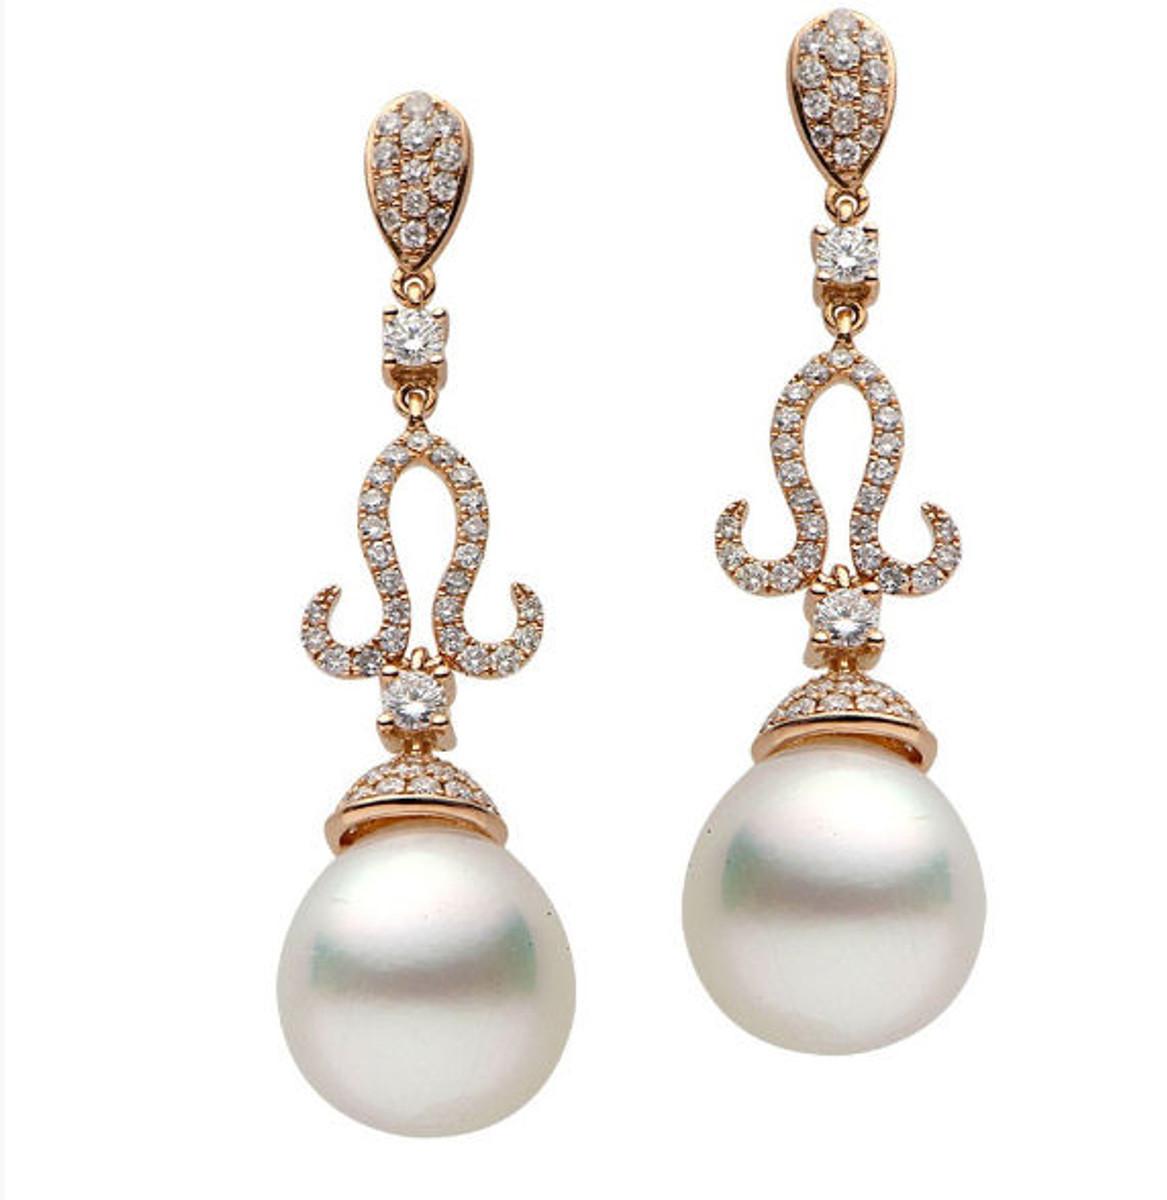 Pearl & Diamond Dangle Earrings 1.04 Ct Tw